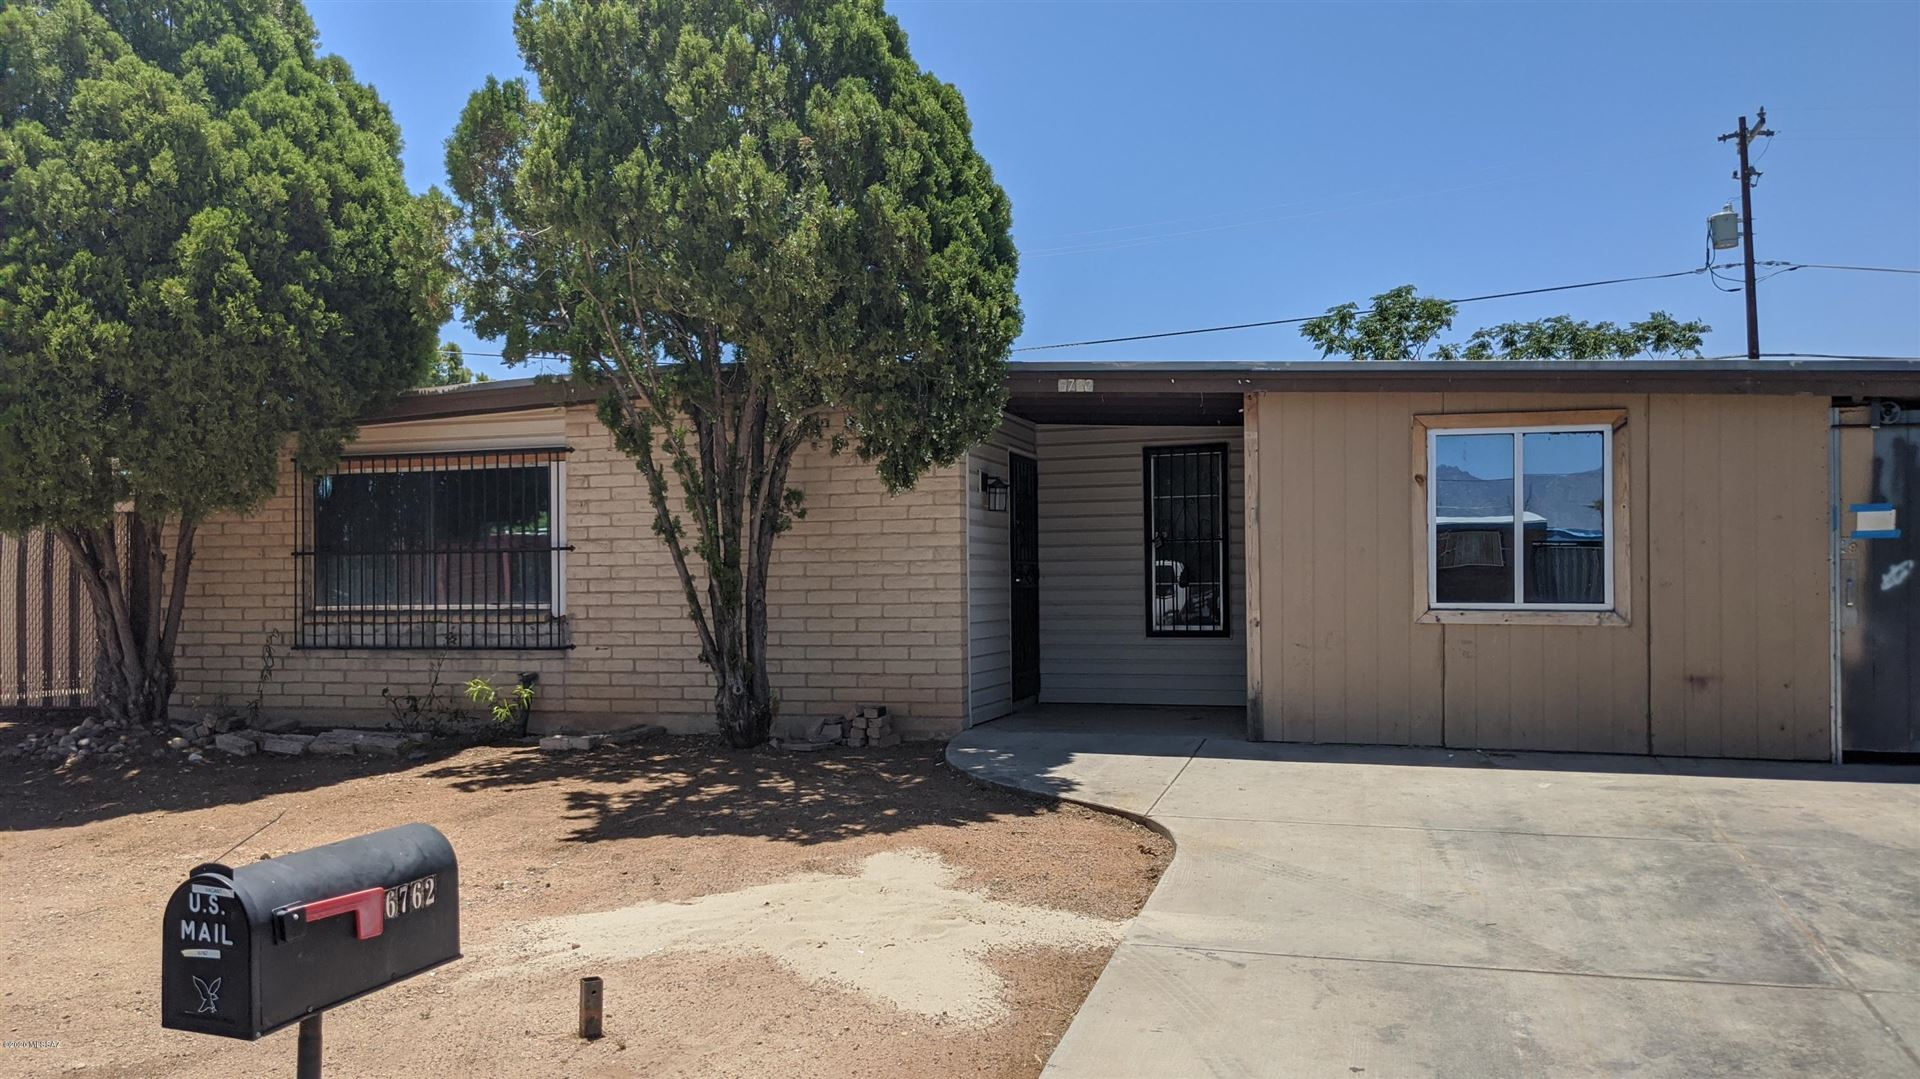 6762 E 45Th Street, Tucson, AZ 85730 - MLS#: 22016114